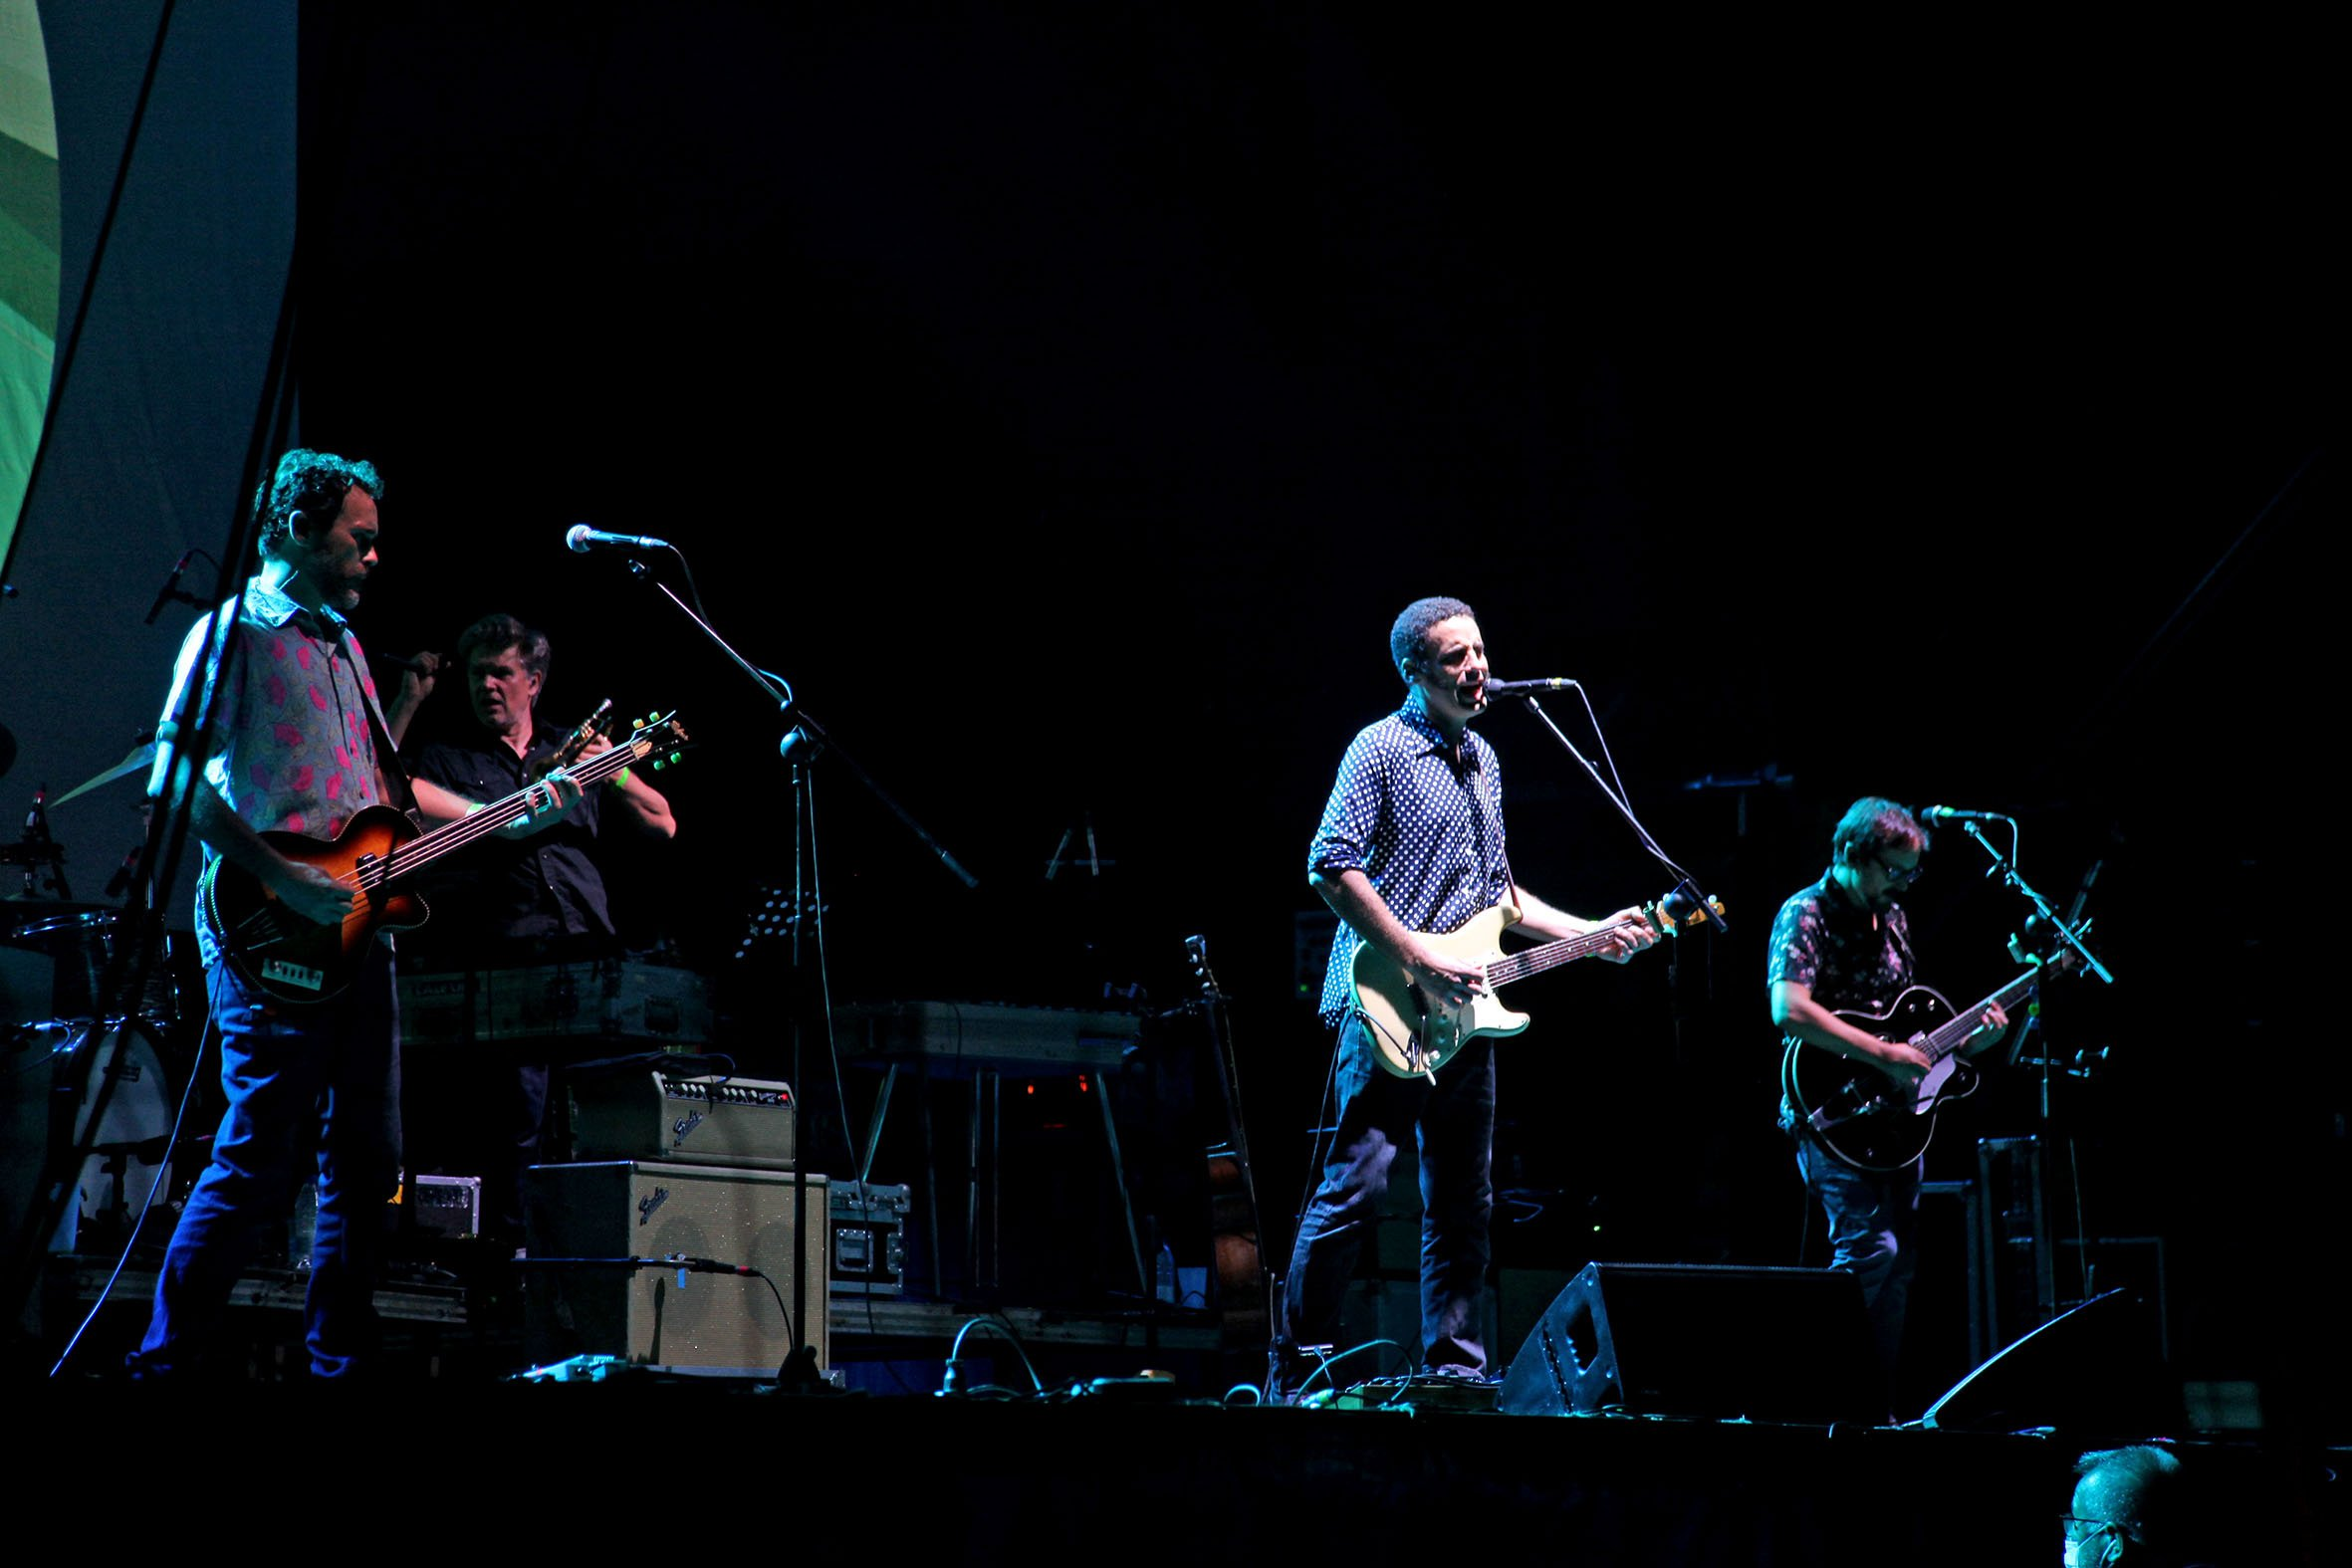 La banda DePedro en el Montgorock Xàbia Festival